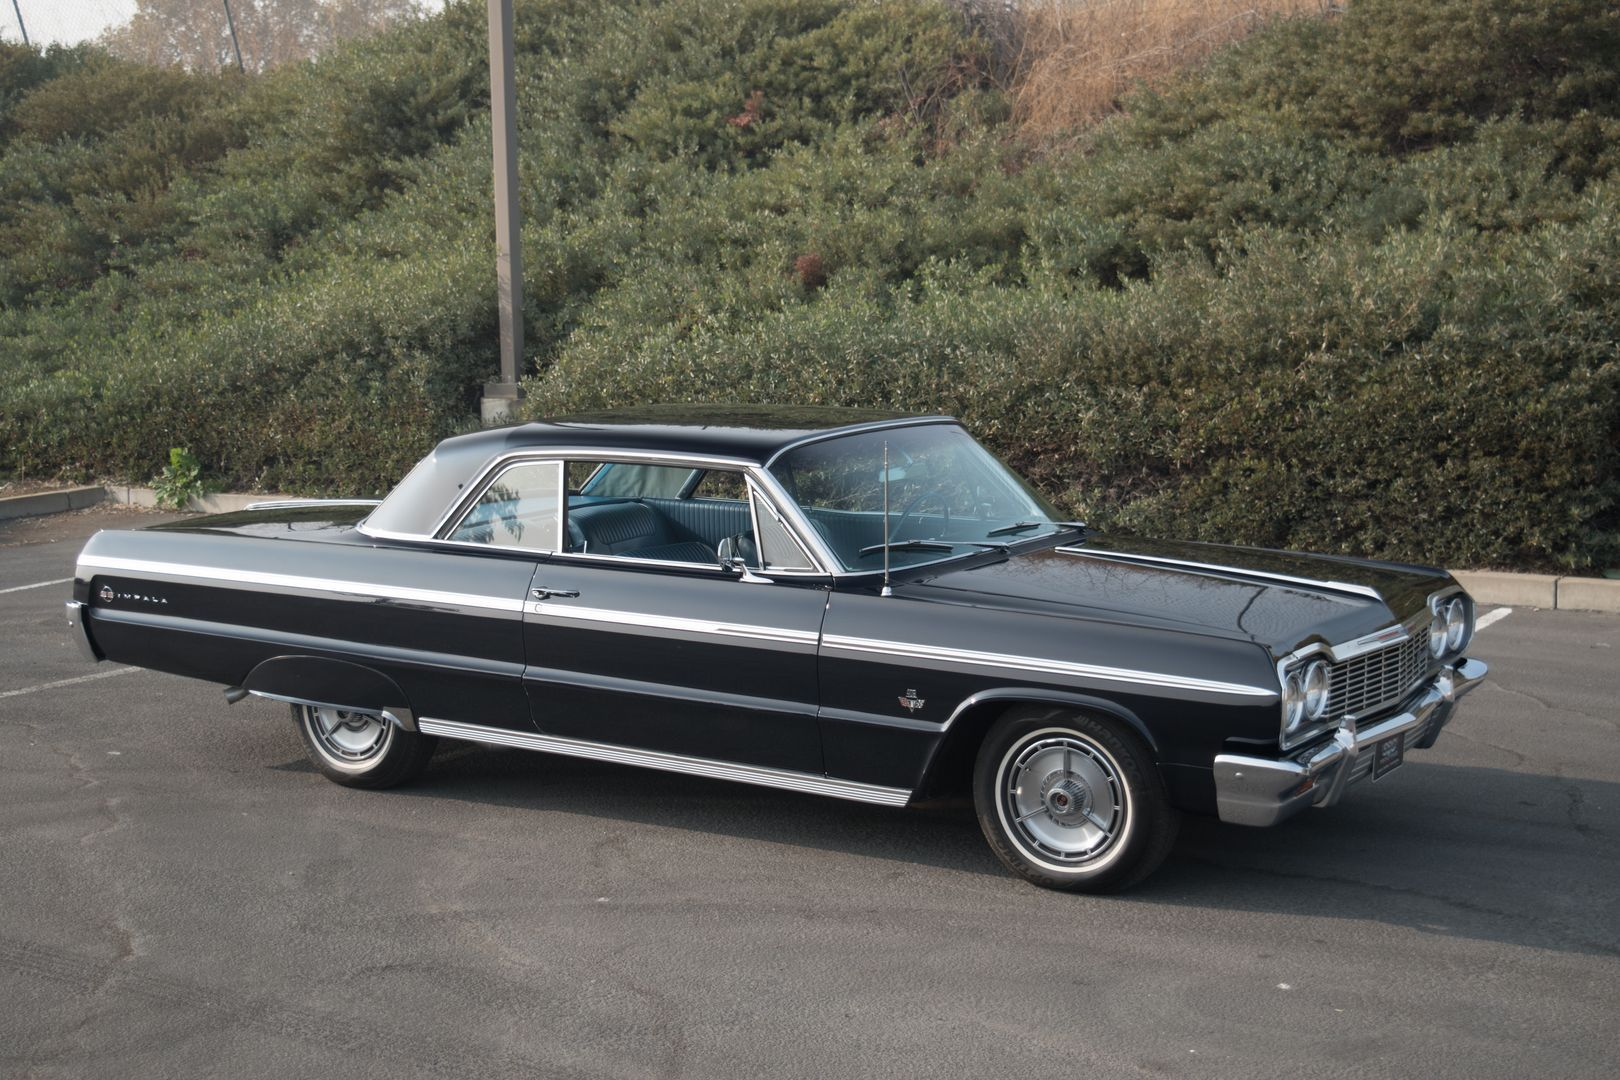 1964 Chevrolet Impala 31 Chevrolet Impala Chevrolet Impala